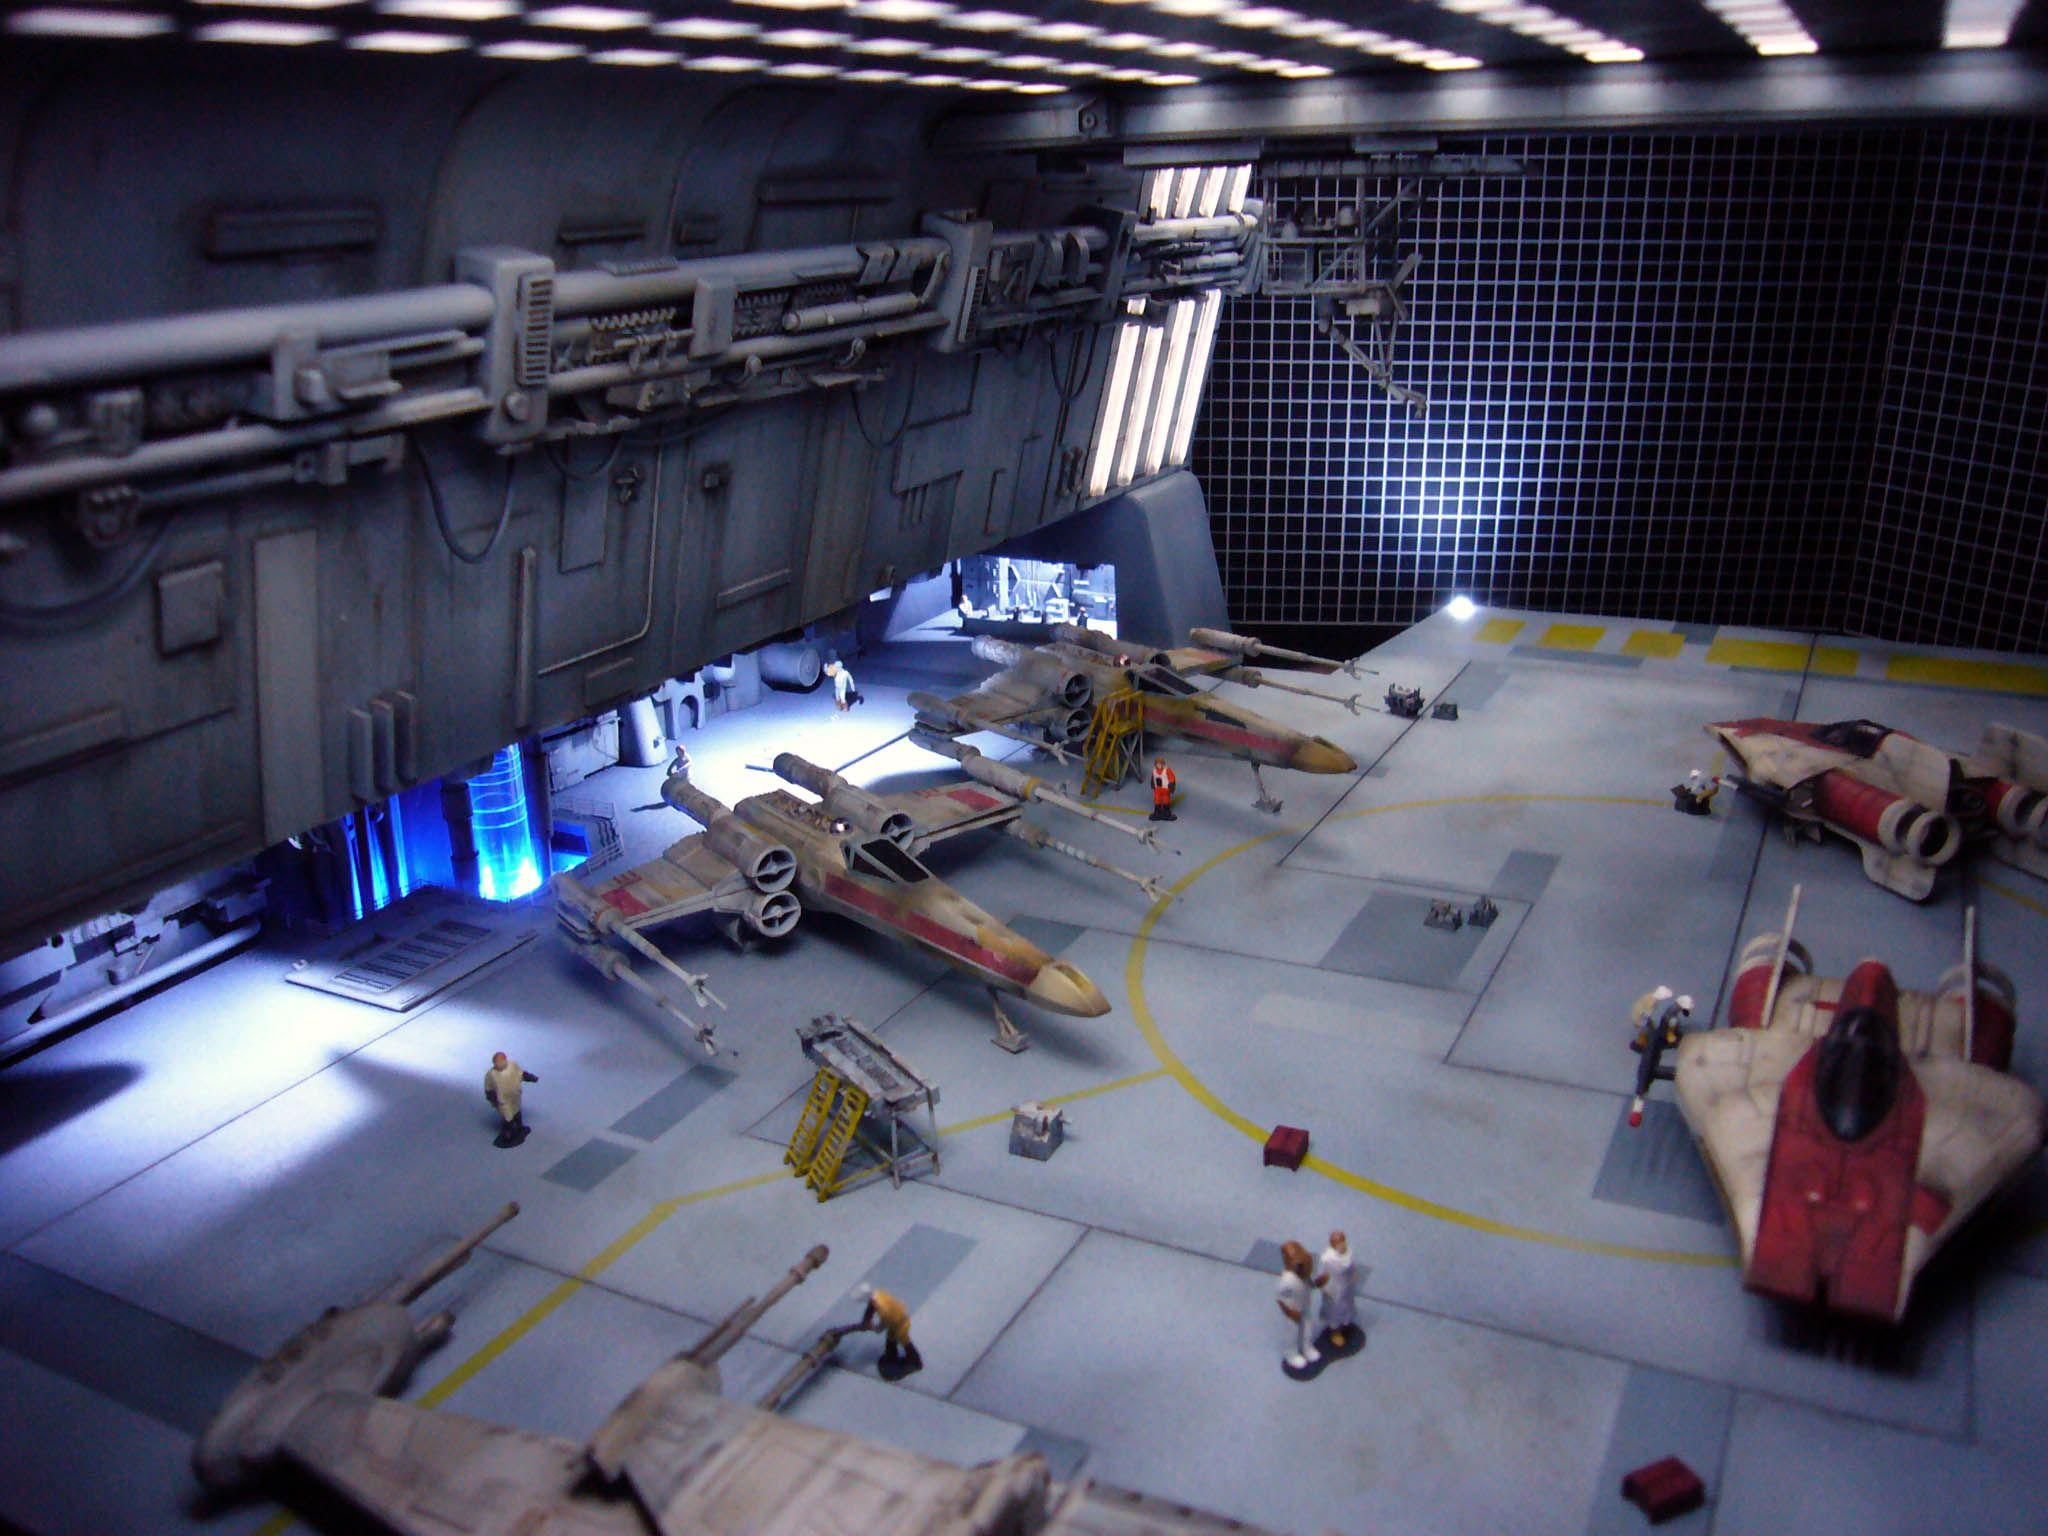 Pin by A Alpern on Star Wars - Model Building | Star wars